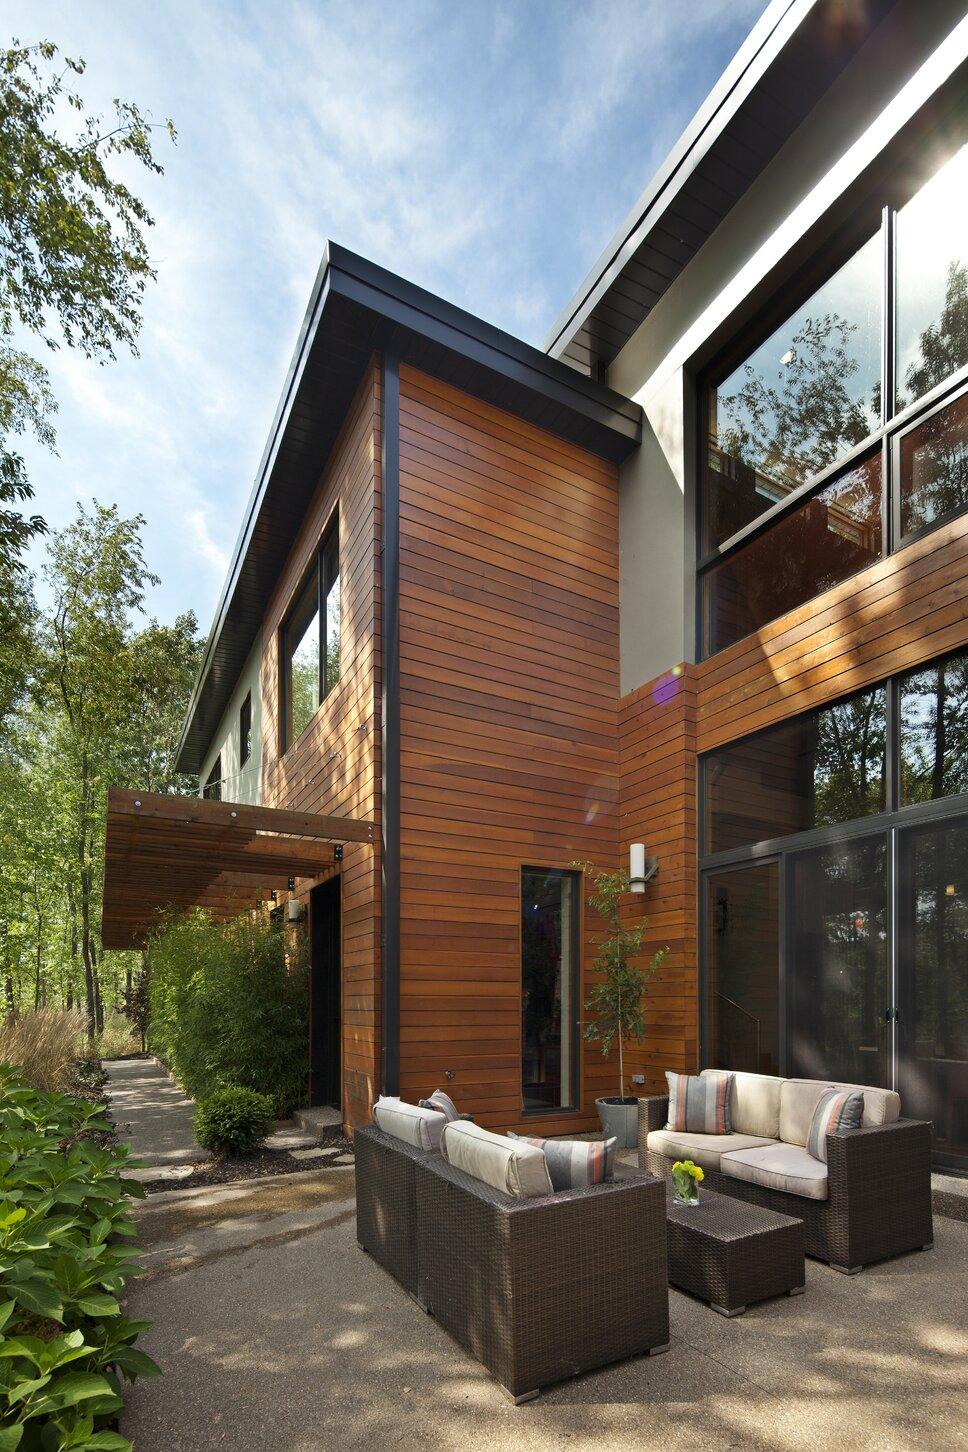 Modern Exterior, Deck, & Patio design